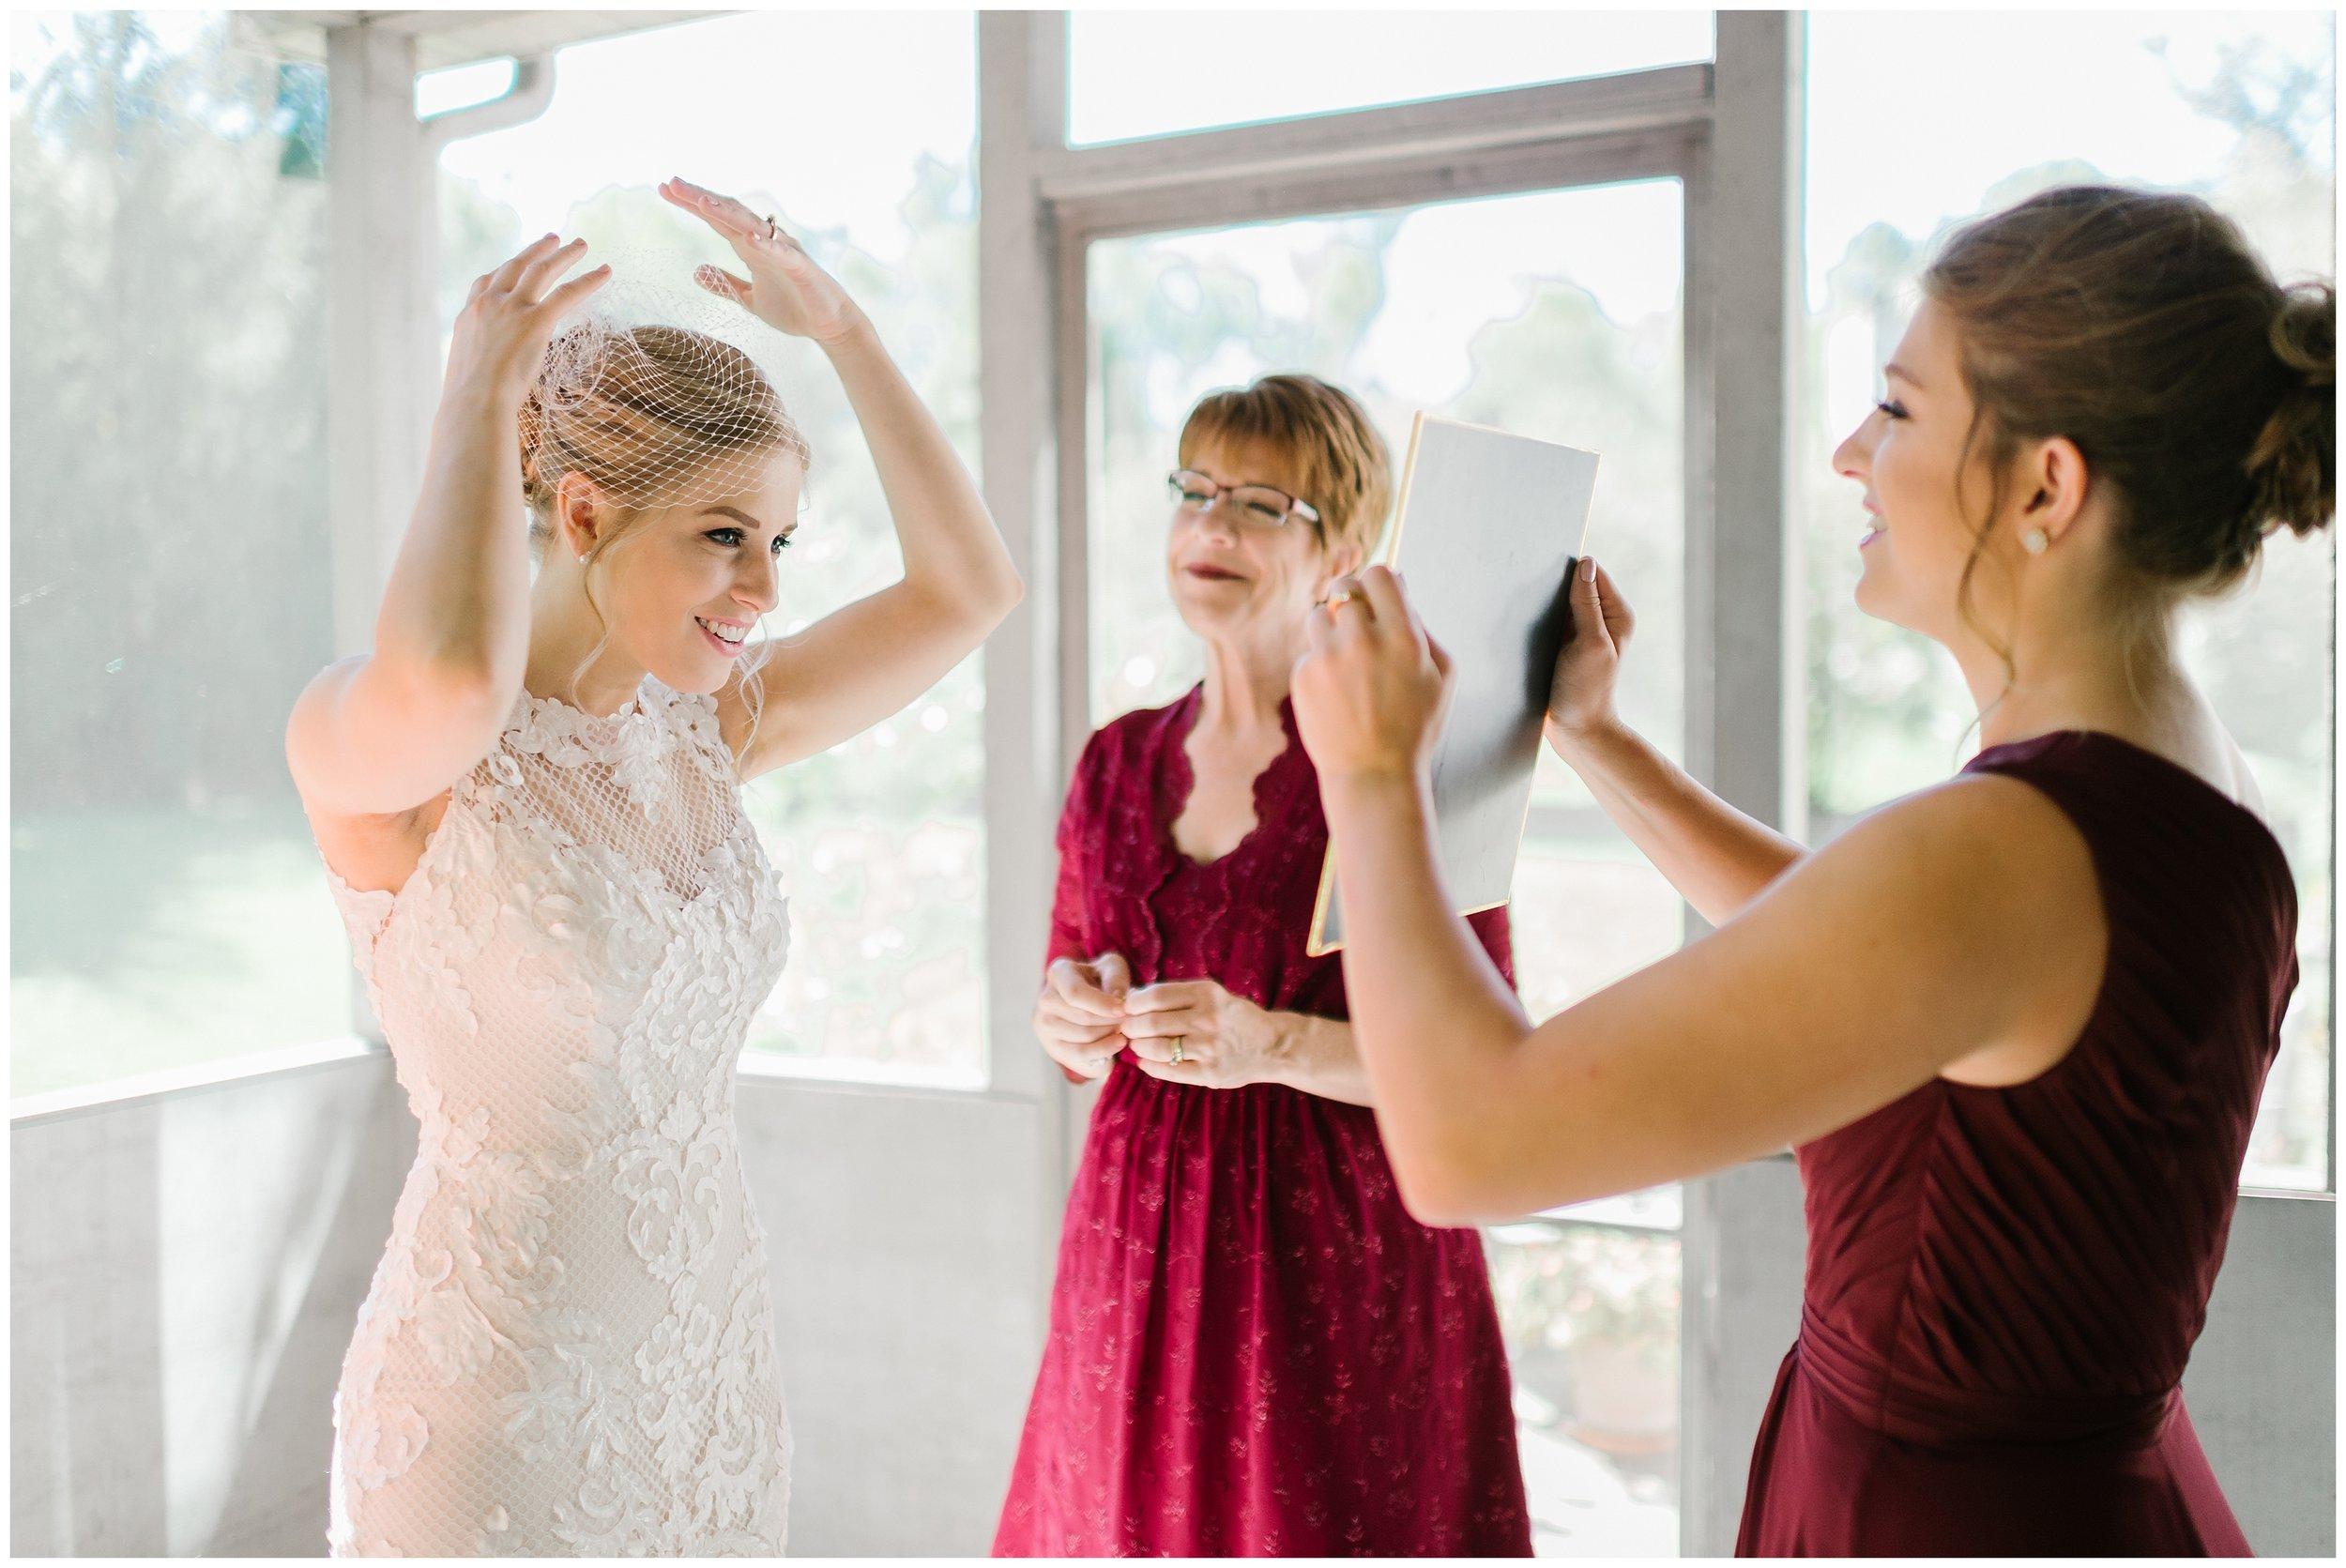 Rebecca_Shehorn_Photography_Indianapolis_Wedding_Photographer_7304.jpg